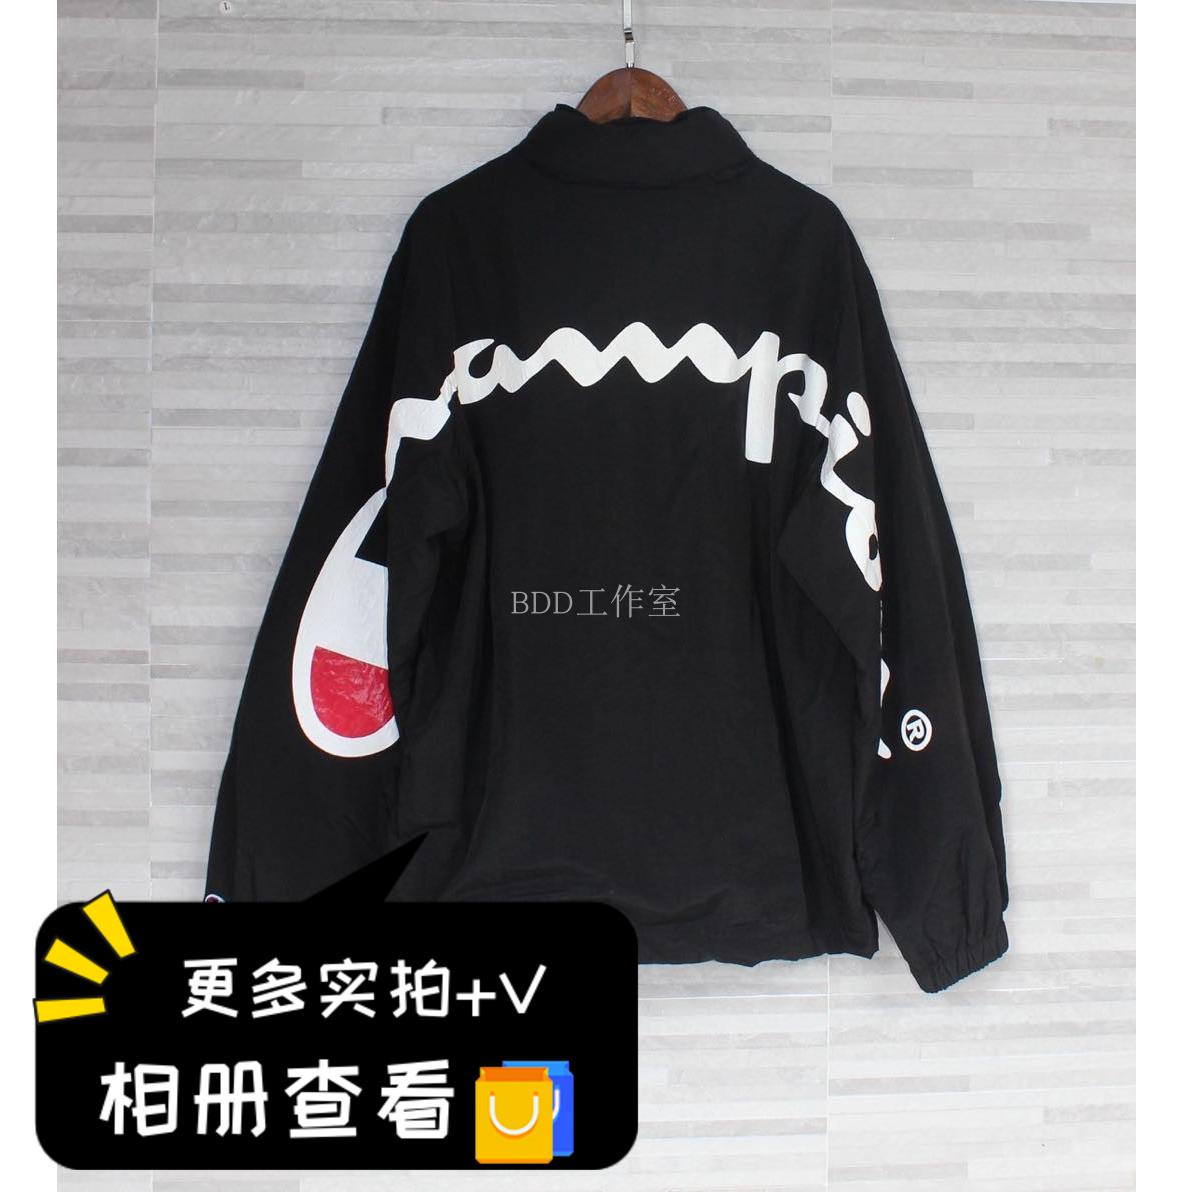 Fanliangfeng co branded 2018 autumn jacket casual assault coat windbreaker back logo coat